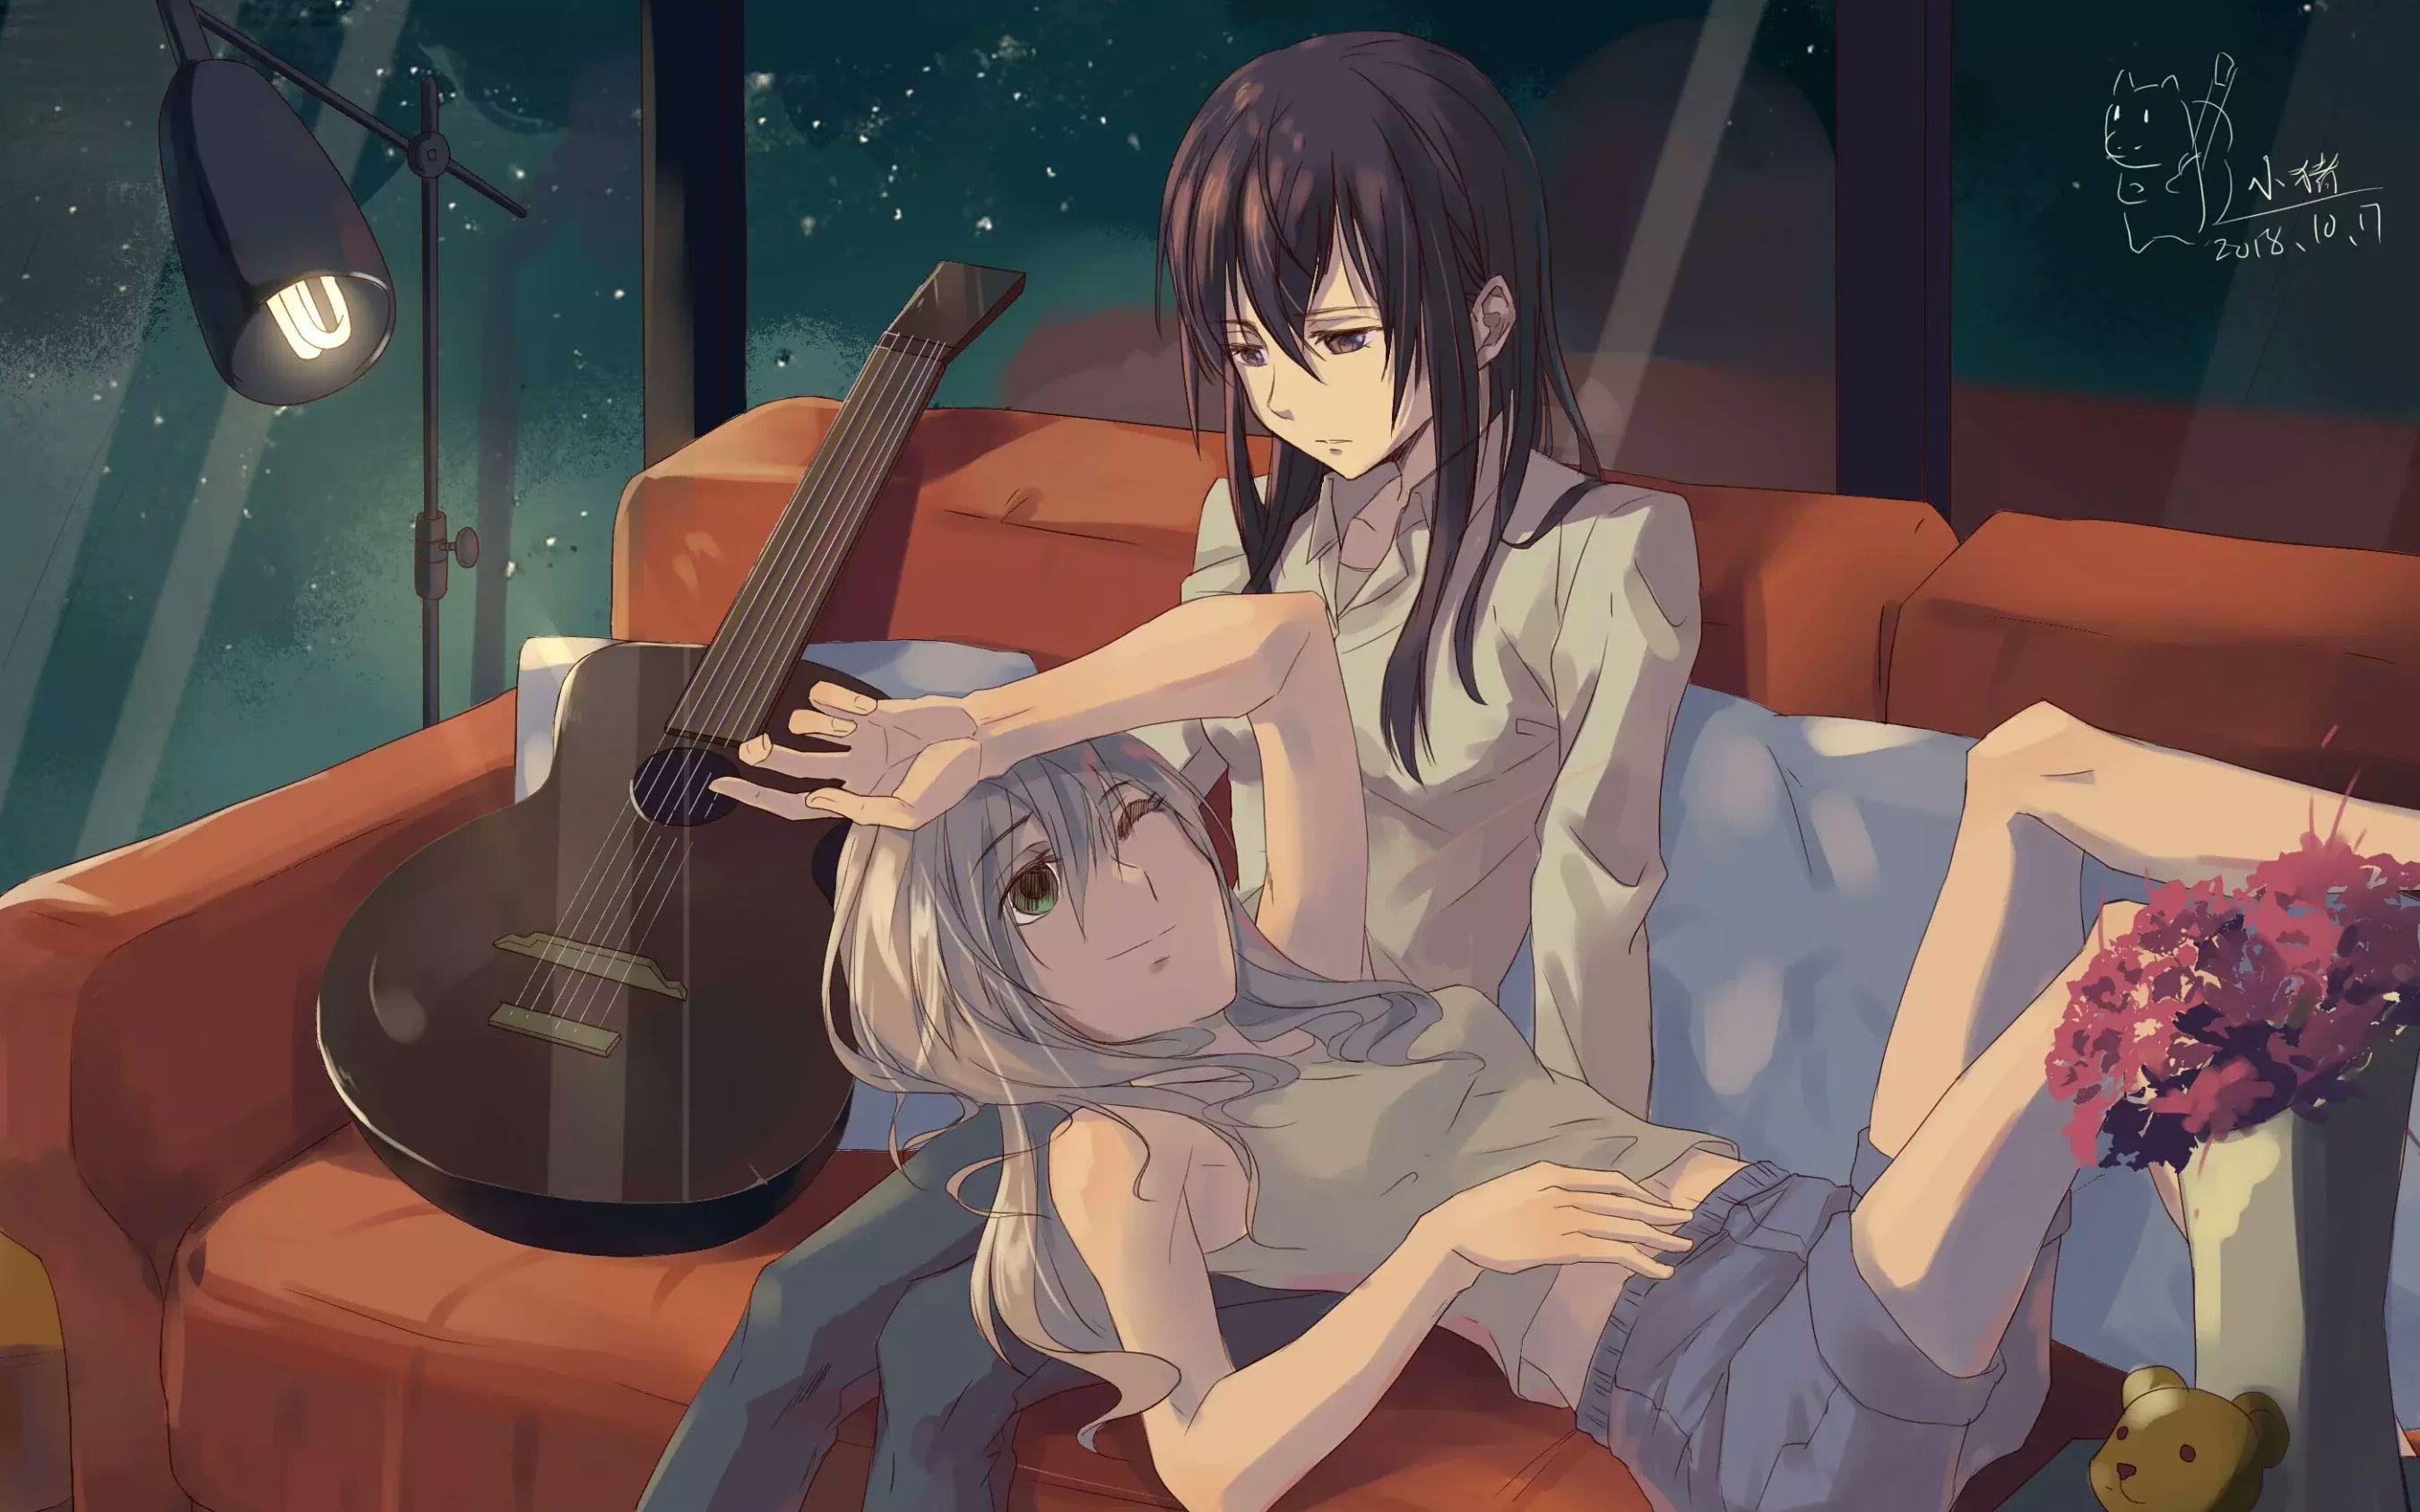 Wallpaper Anime Girls Yuri Citrus Manga Long Hair Dark Hair Purple Eyes Guitar 2700x1687 Eko 1775021 Hd Wallpapers Wallhere